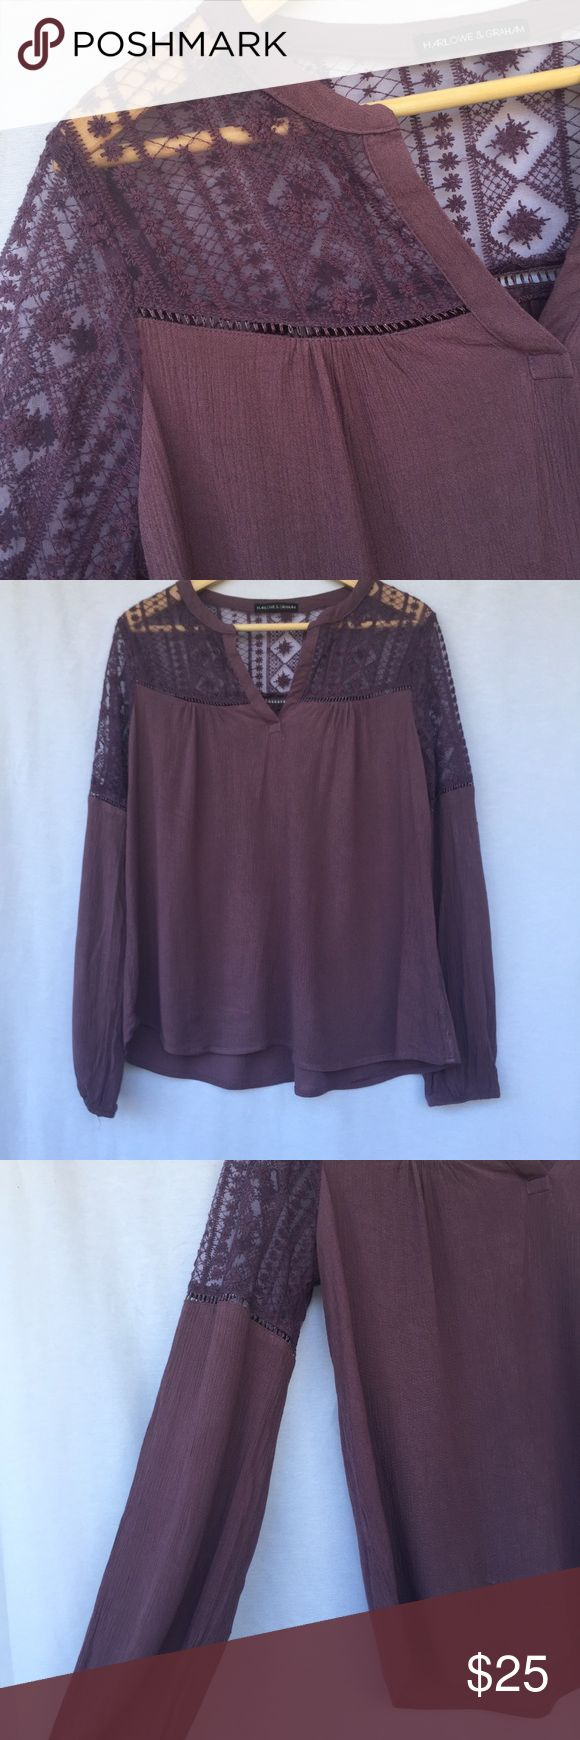 Harlowe & Graham Purple Peasant Top Beautiful sheer crochet shoulder top with peasant sleeves. great condition. Comfortable and light. Harlowe & Graham Tops Blouses